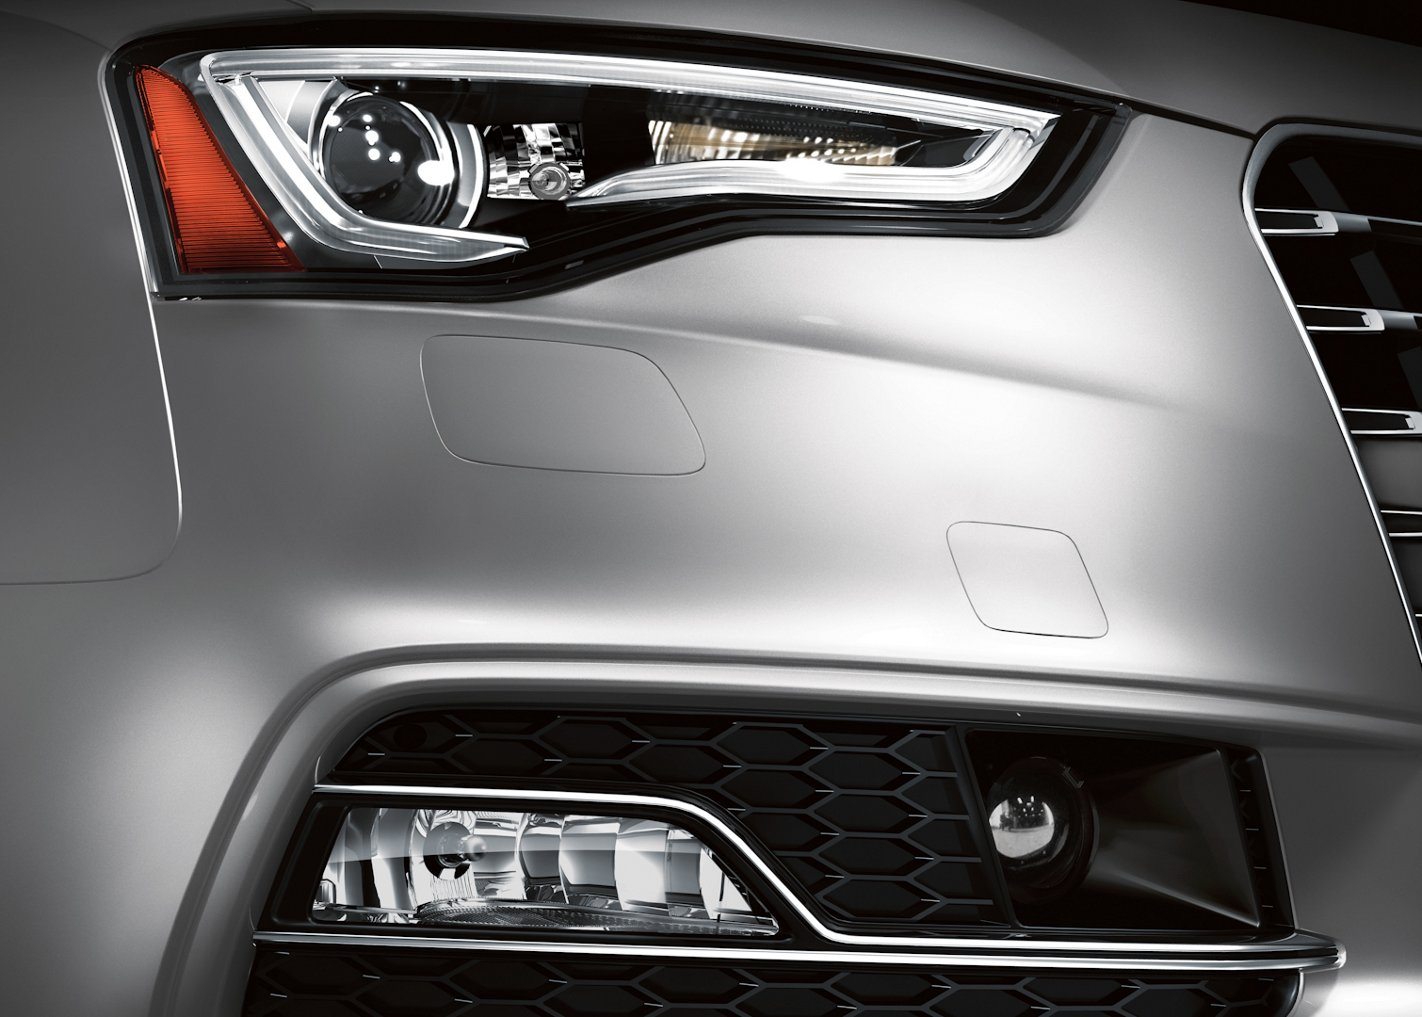 New Audi S5 Exterior image 2